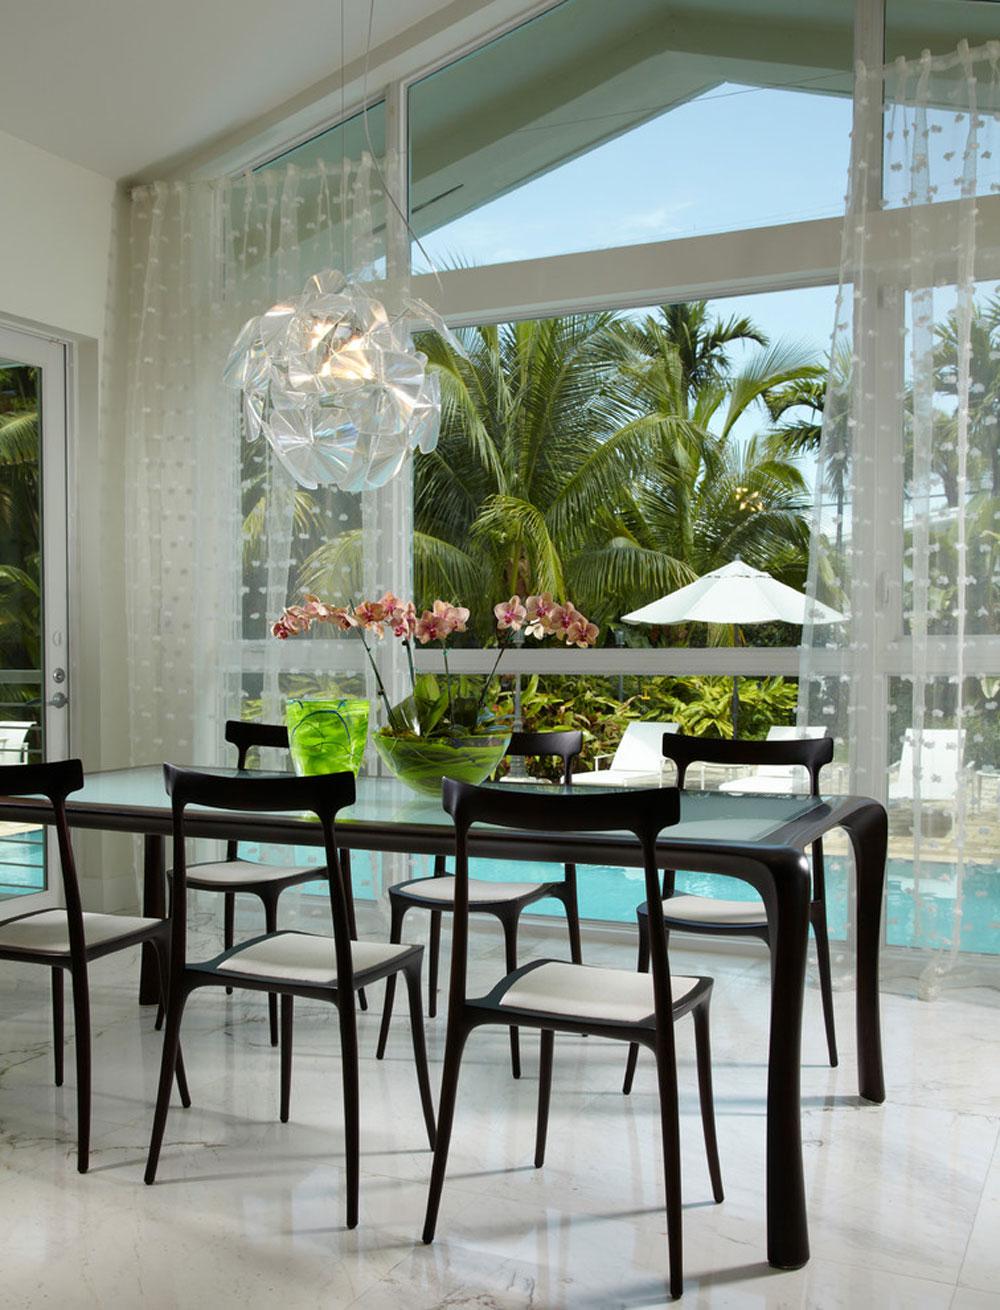 Contemporary dining room4 contemporary and modern interior design characteristics